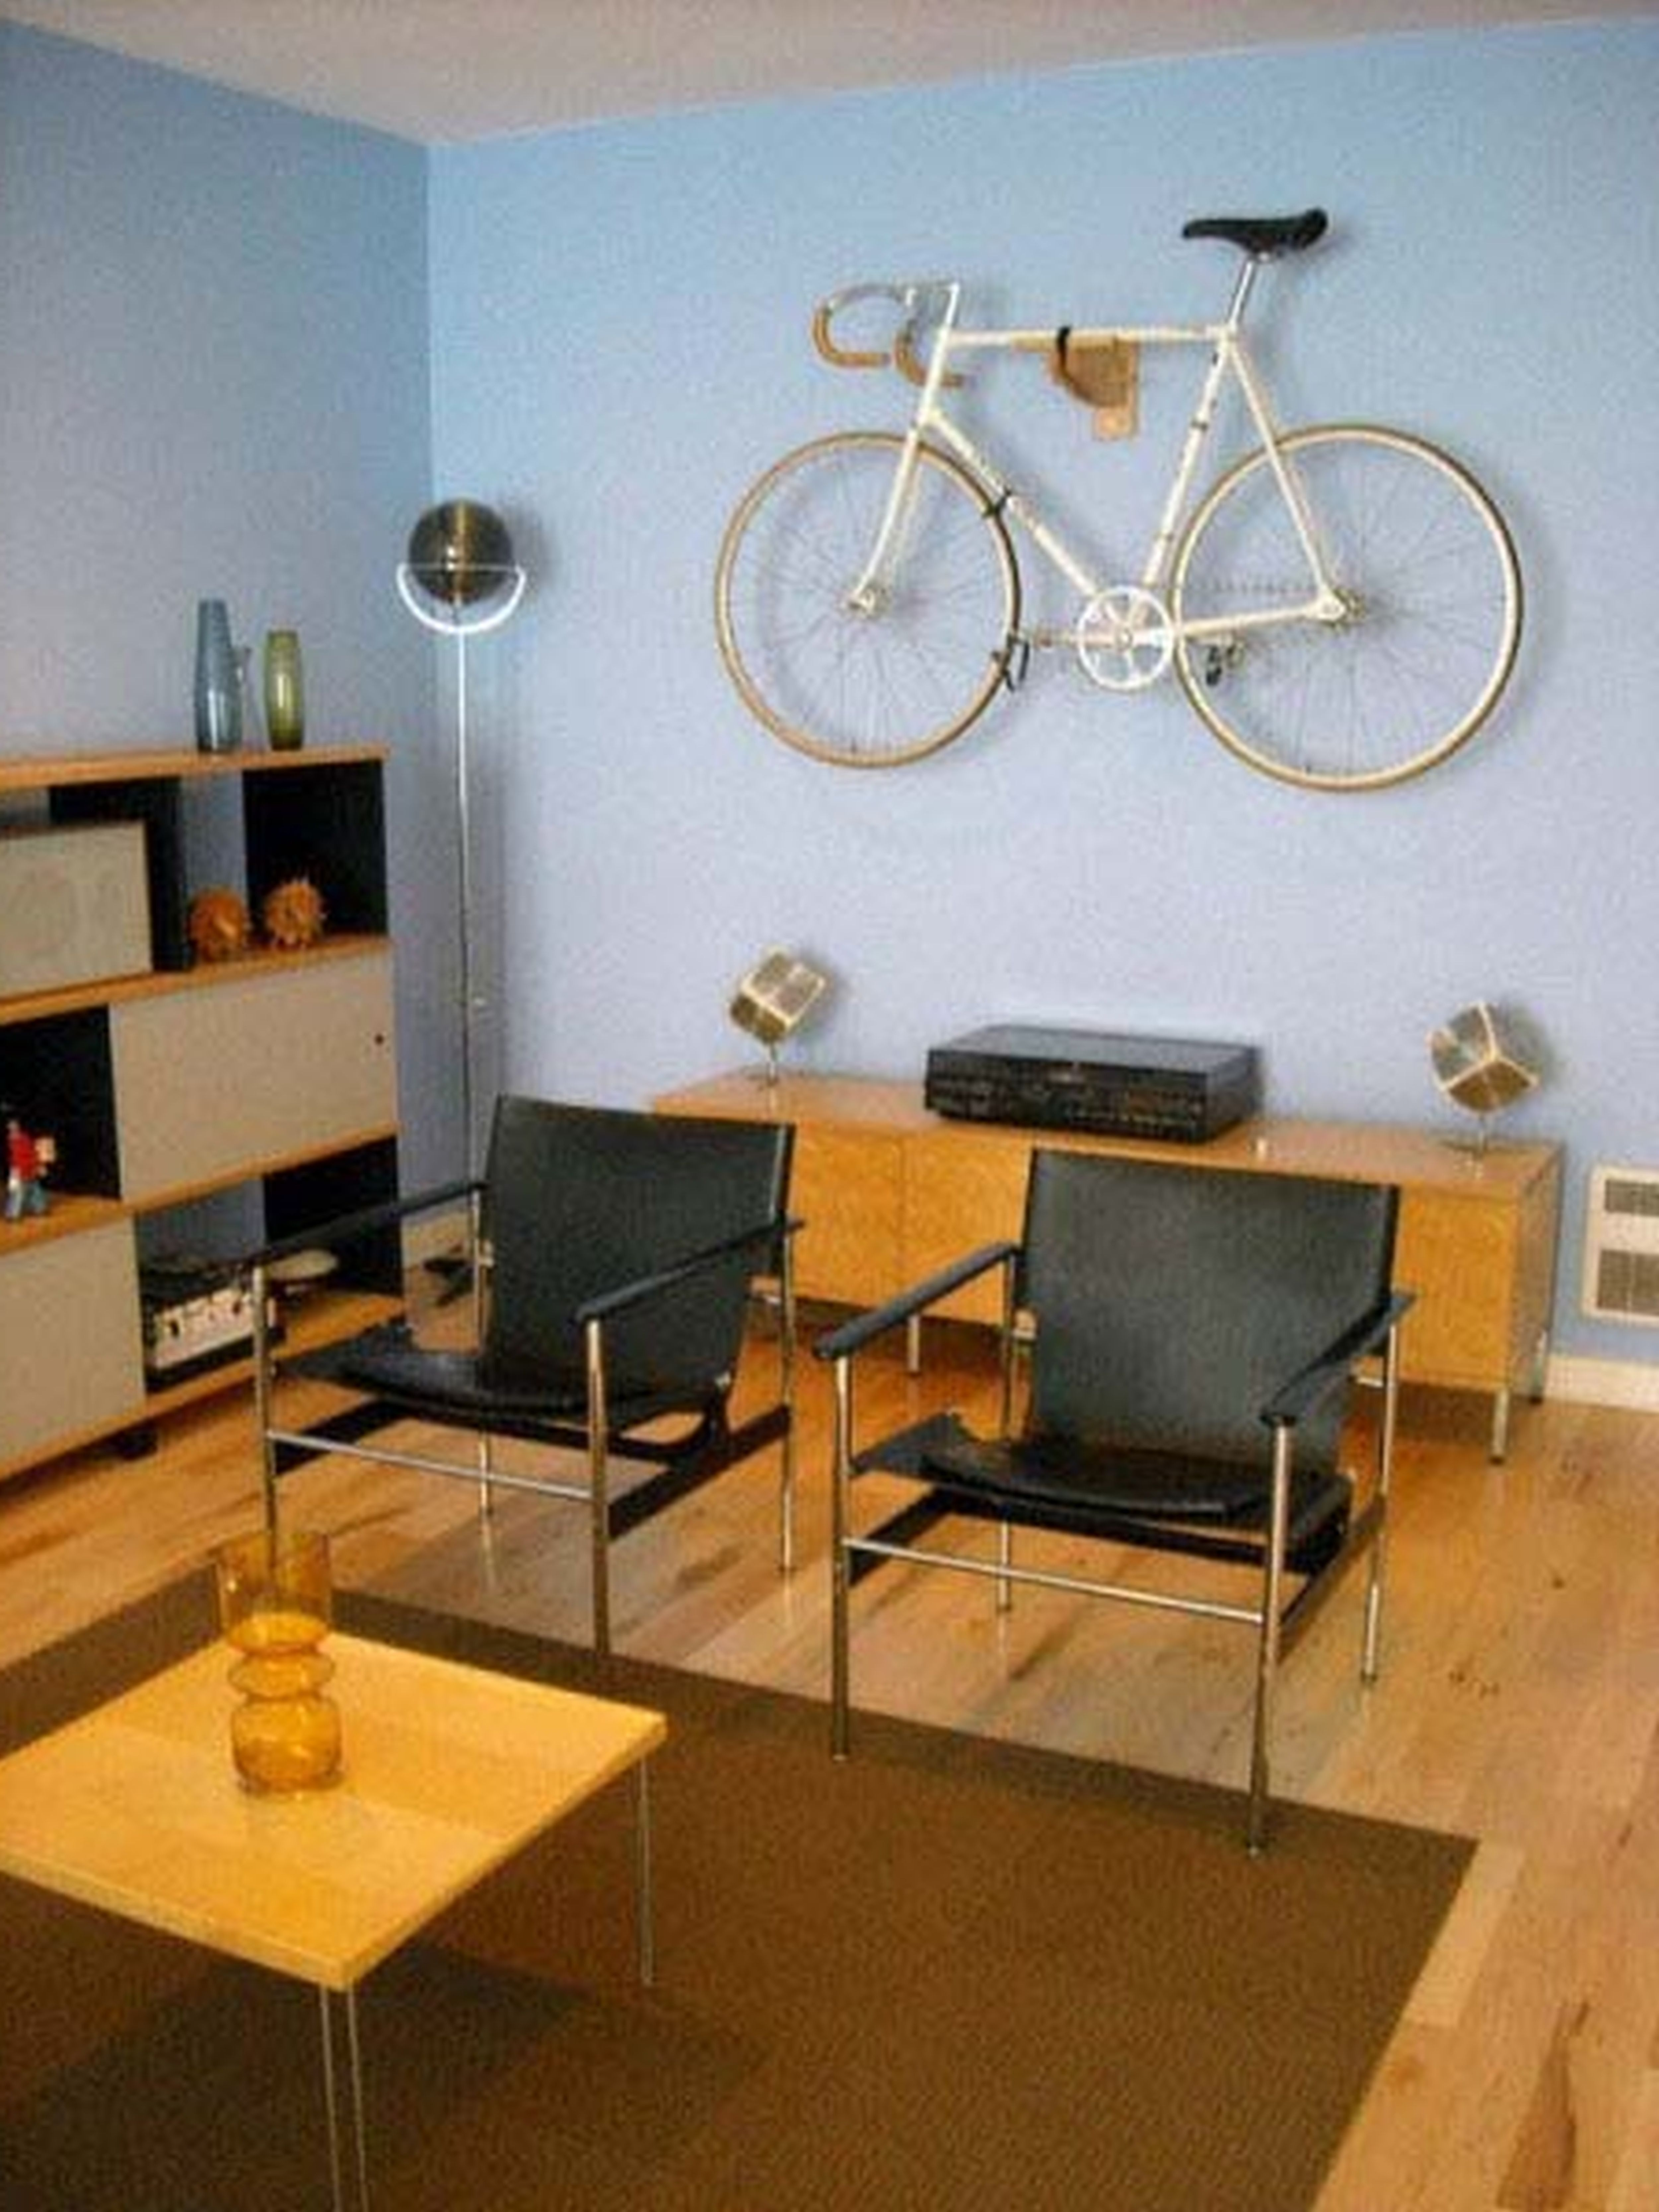 Bike storege in small spaces. | Small apartment bike ...